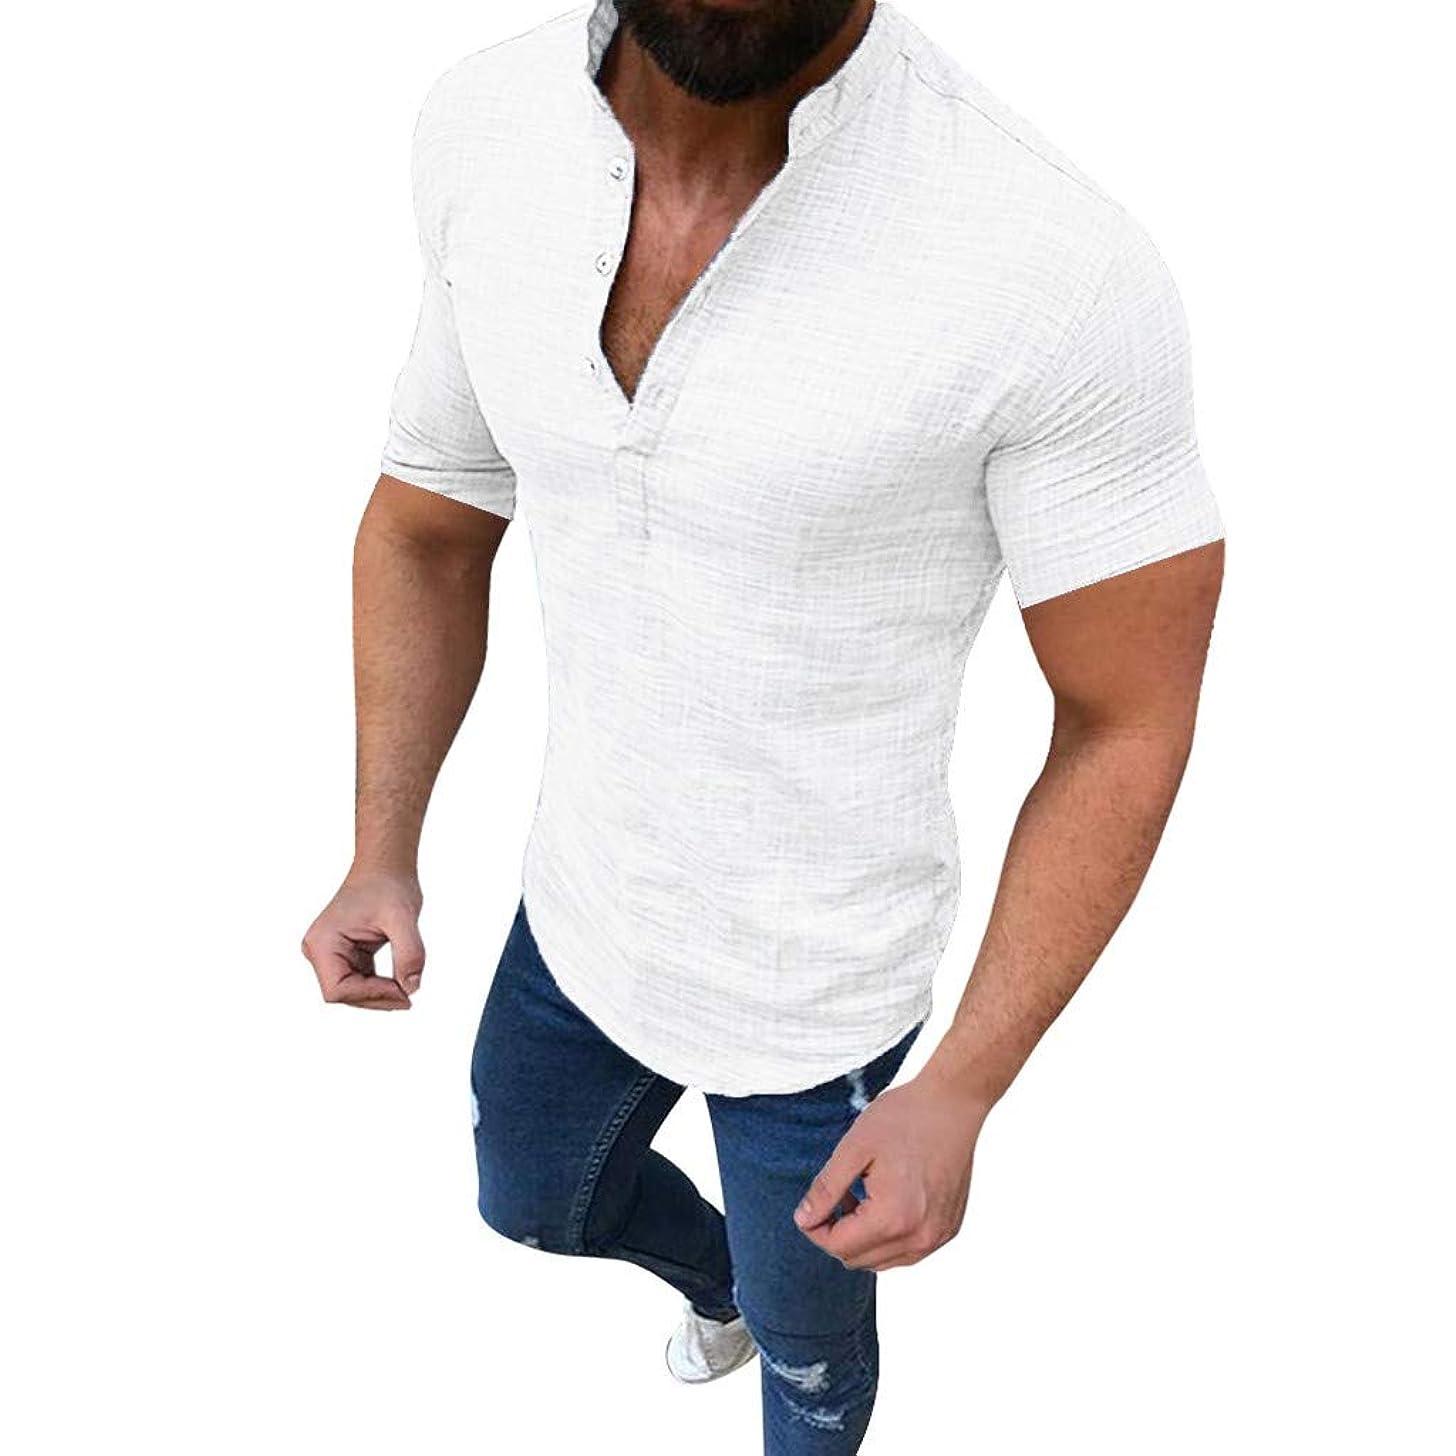 Cotton V Neck T Shirt Short Sleeve Button Up Slim Fit Sold Summer Fashion T-Shirt Tops Tee Shirt